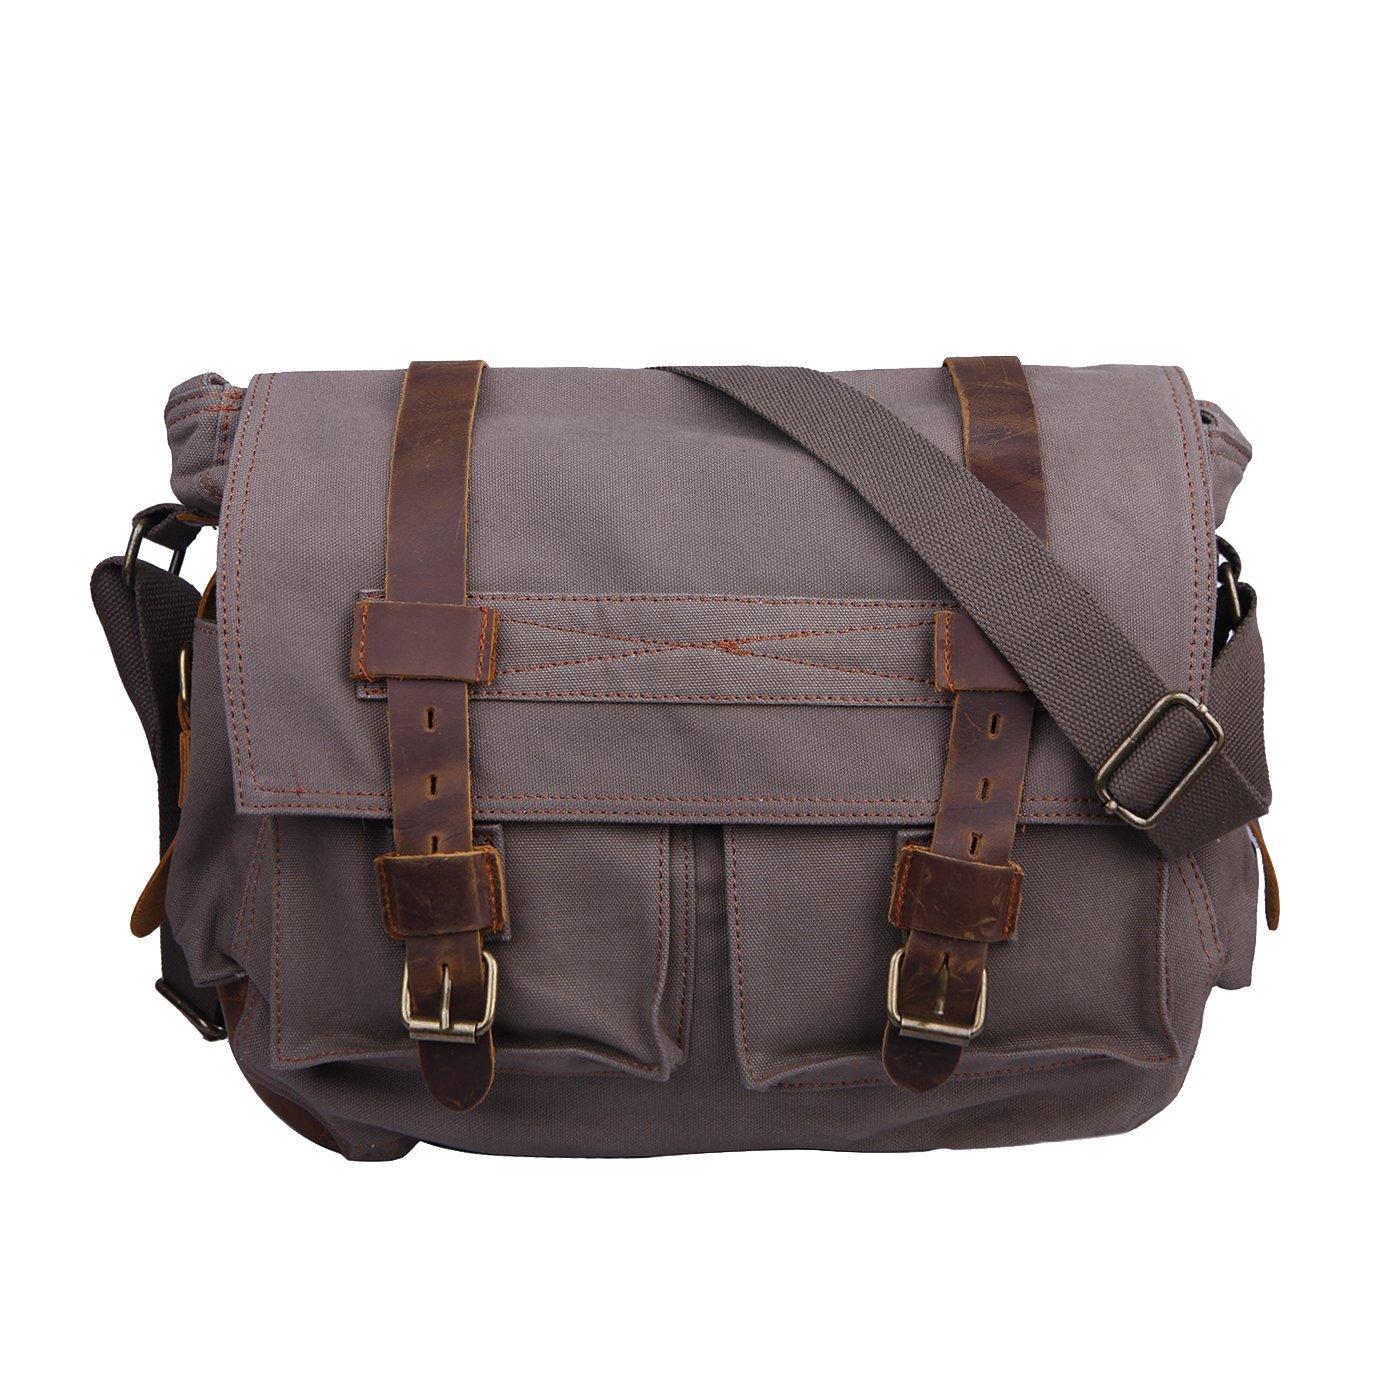 HDE Vintage Canvas Messenger Bag Leather Military Tactical Style Travel Shoulder Field Bag fits 13 Inch Laptop